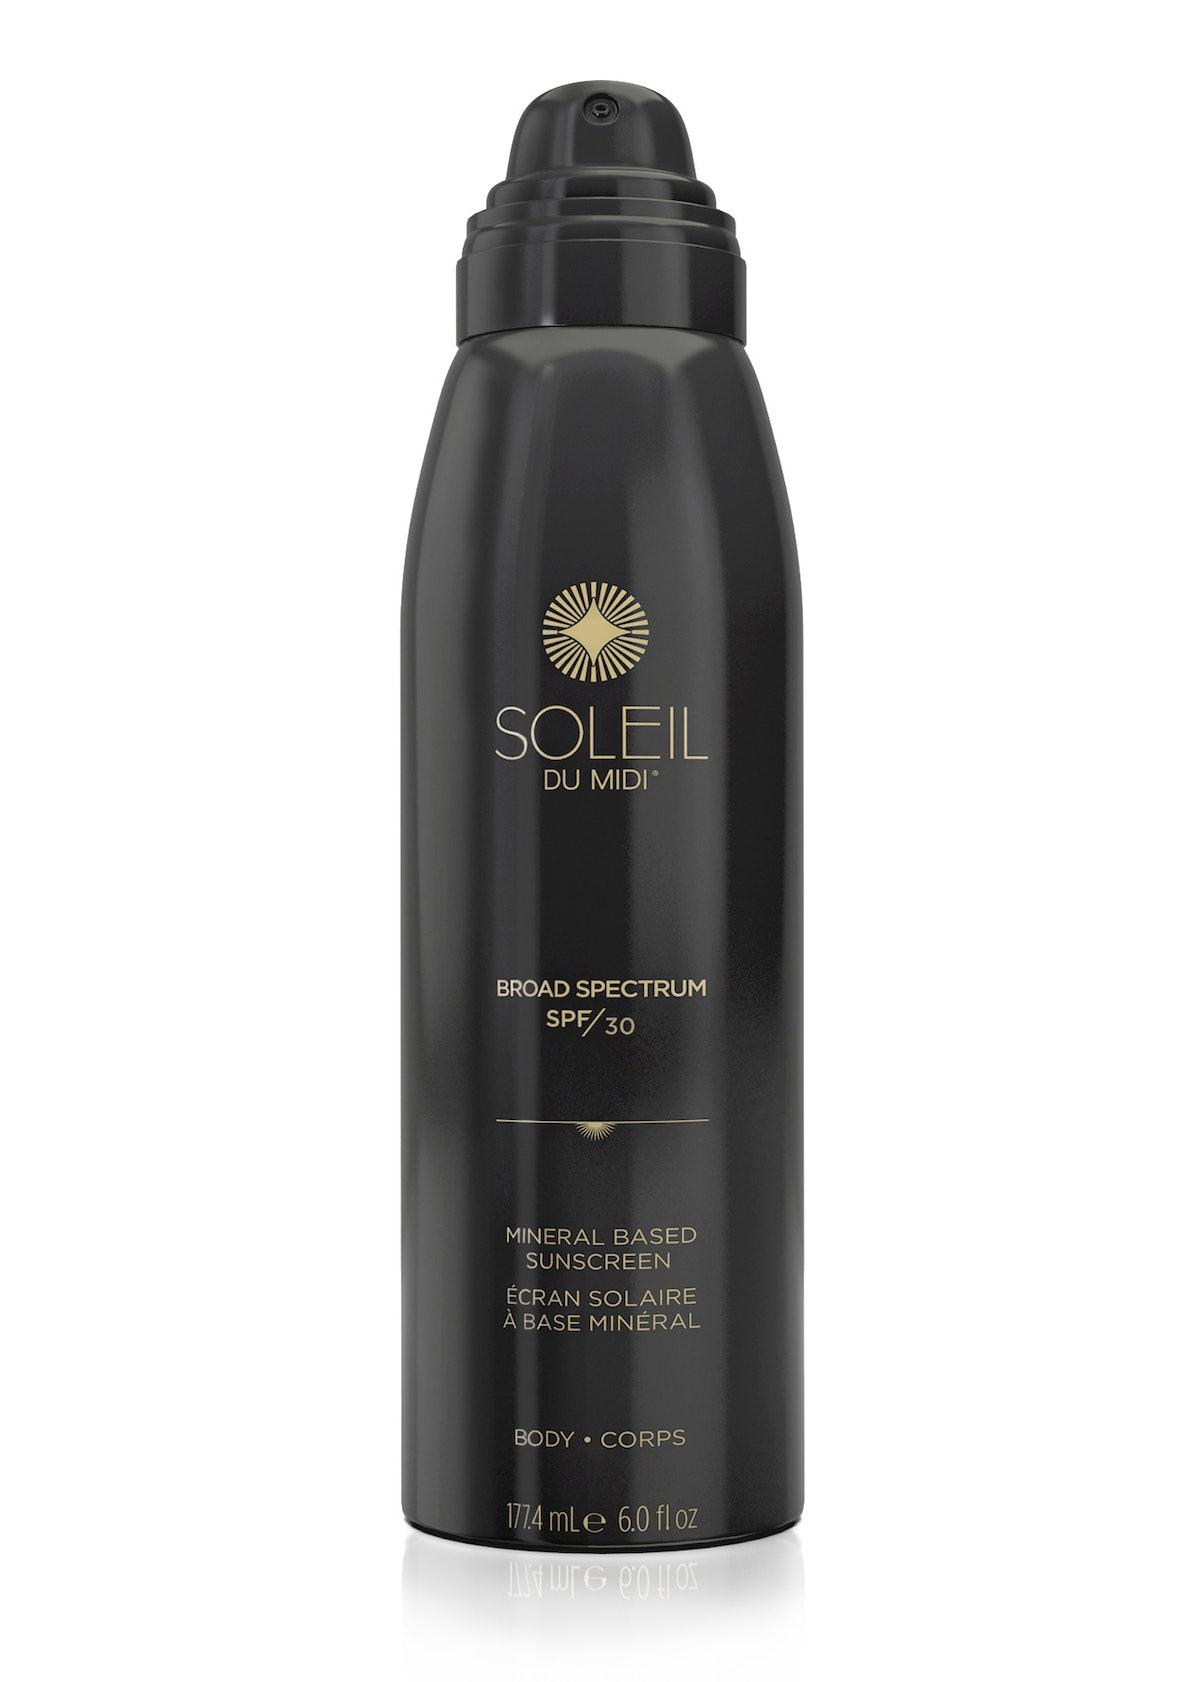 Soleil Toujours Sunscreen Spray